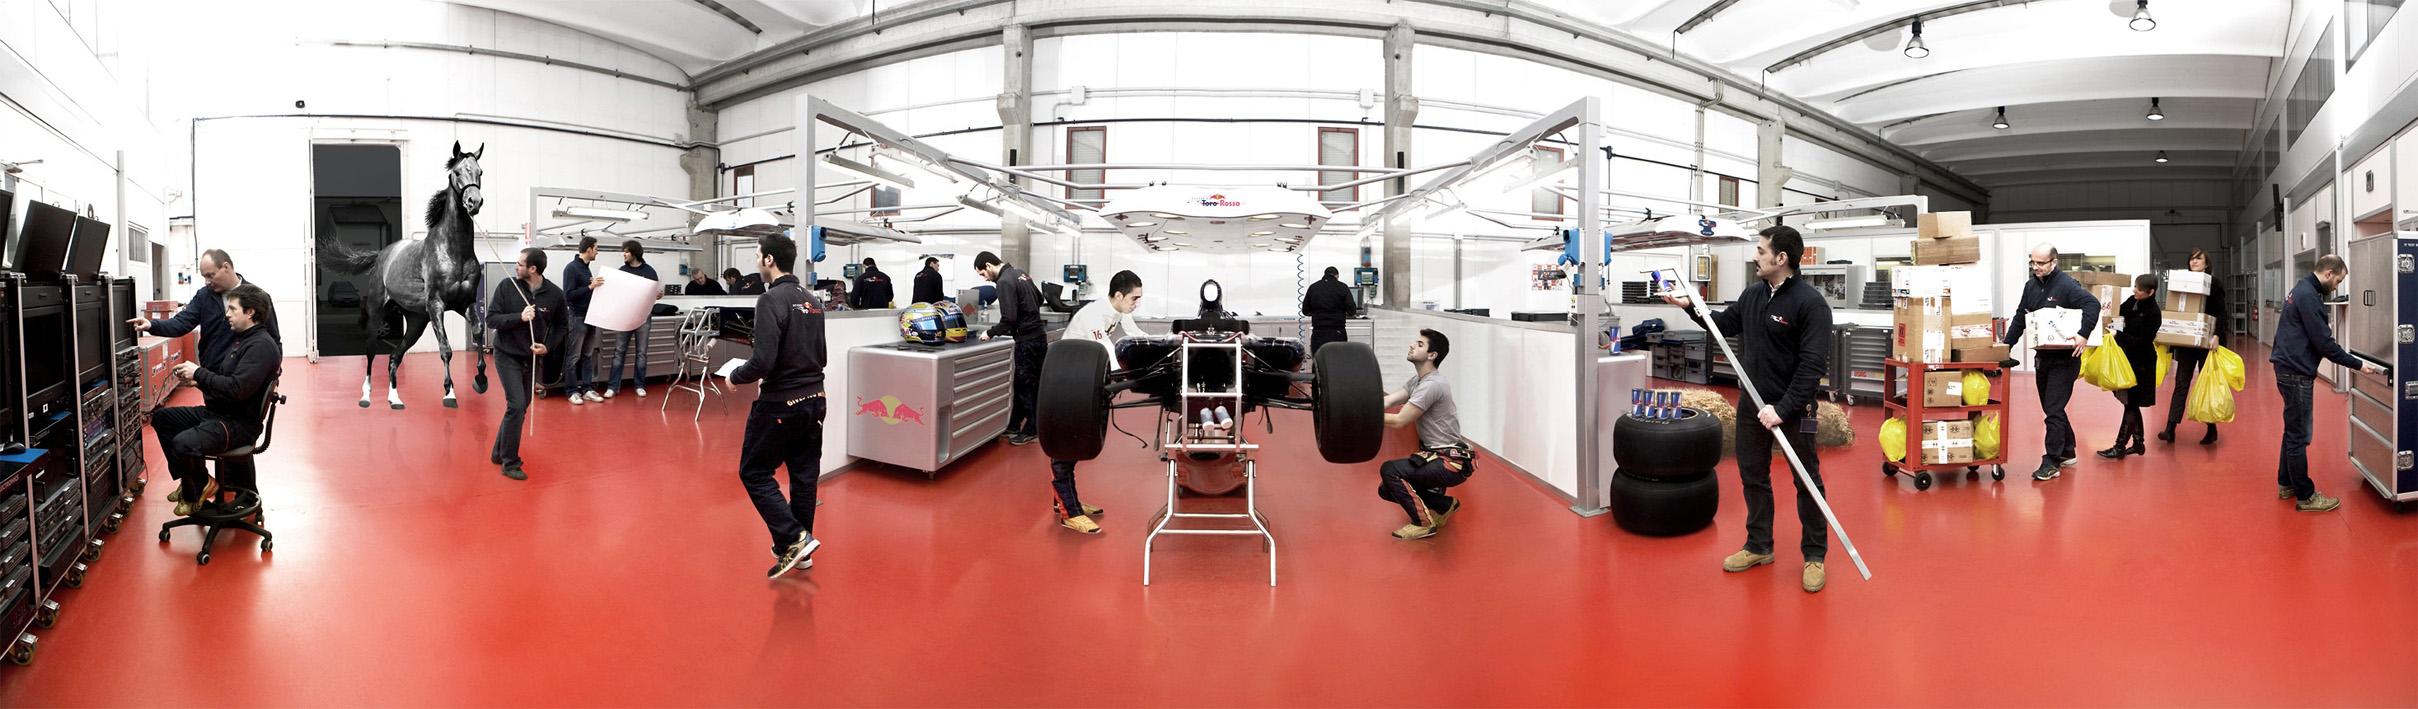 STR online interactive press pack, garage panorama